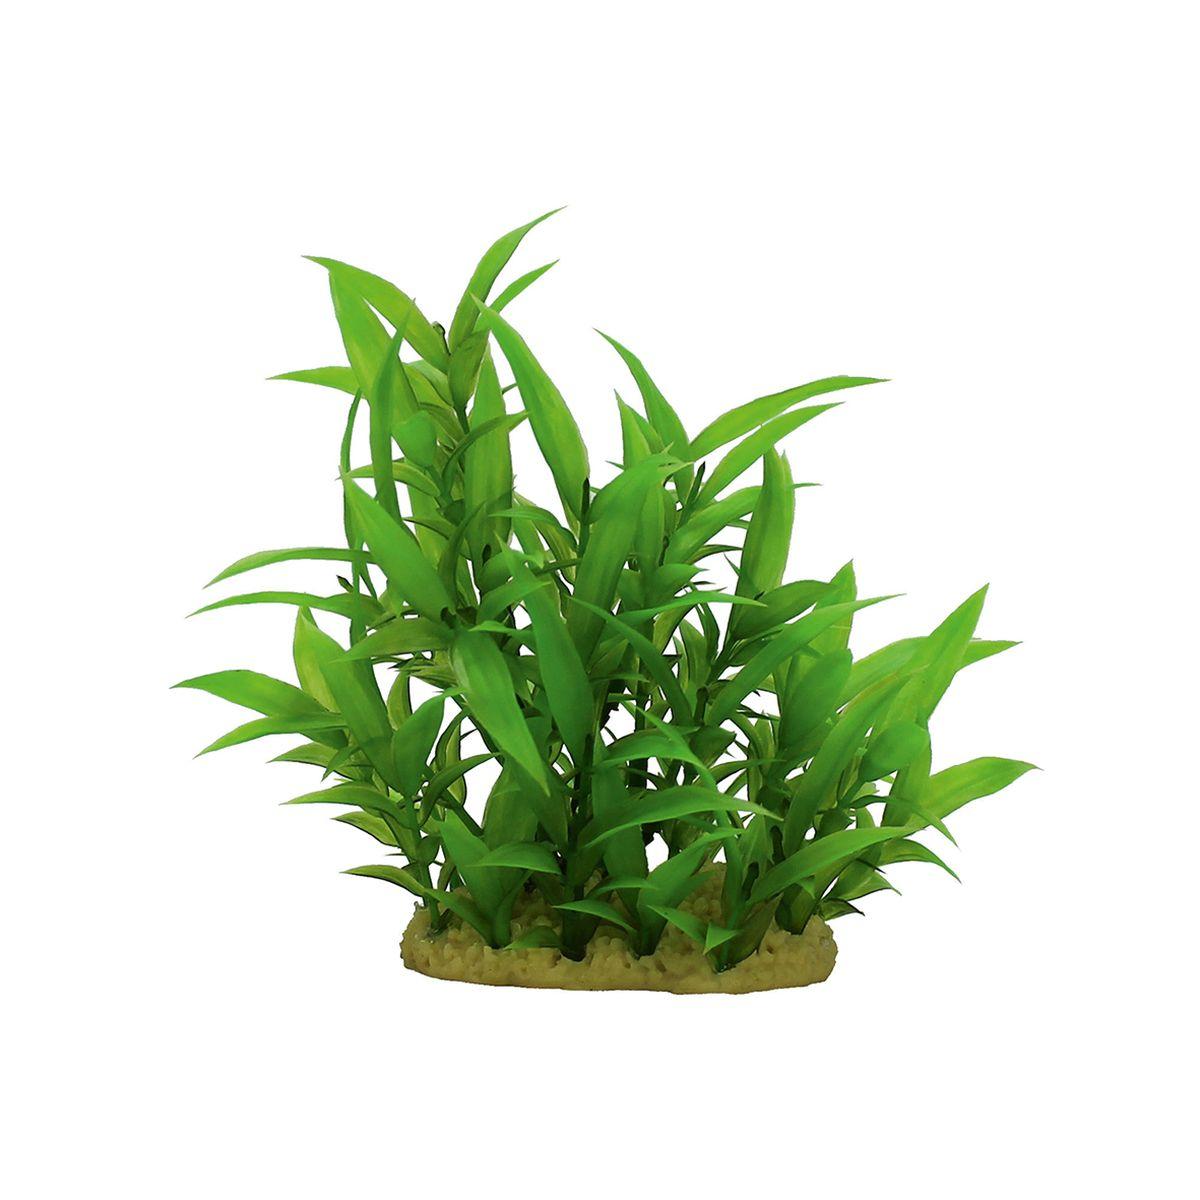 Растение для аквариума ArtUniq Гигрофила сиамская, высота 15 смART-1160118Растение для аквариума ArtUniq Гигрофила сиамская, высота 15 см